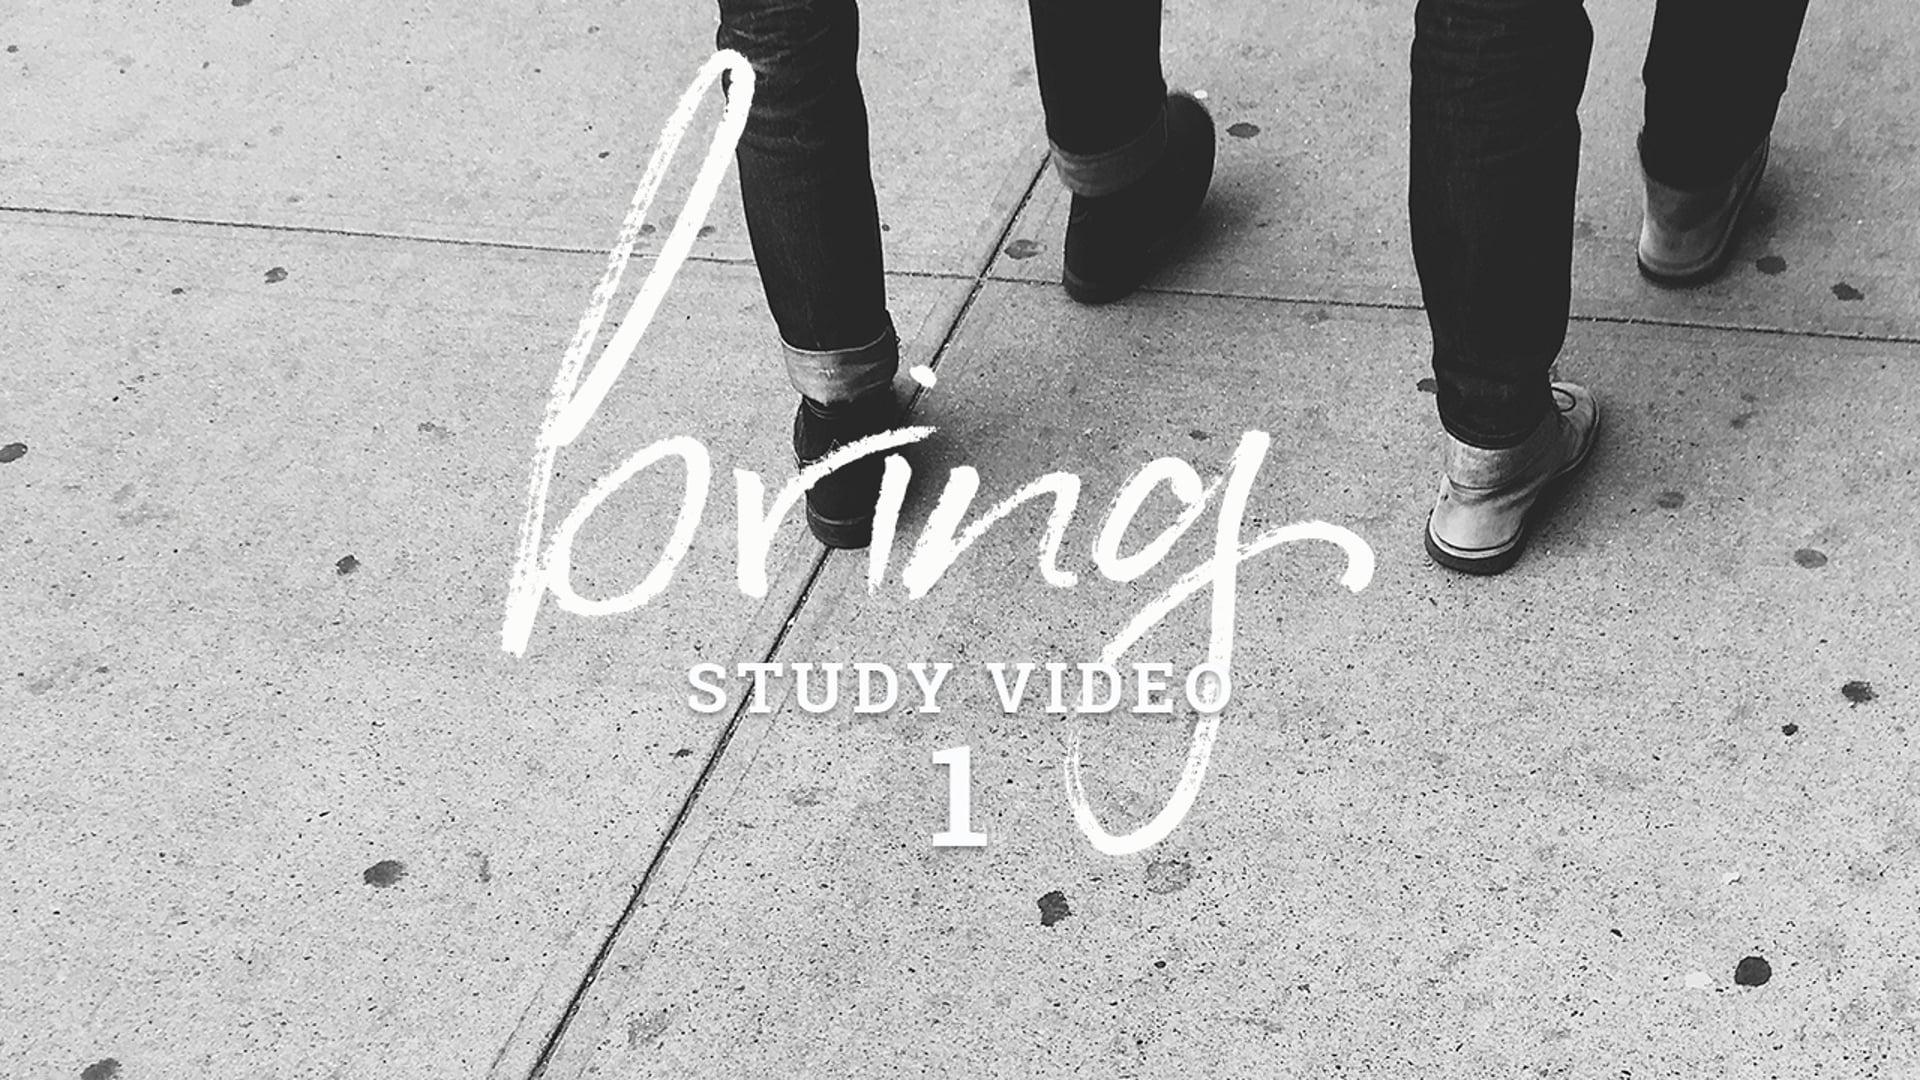 Bring - Study Video 1